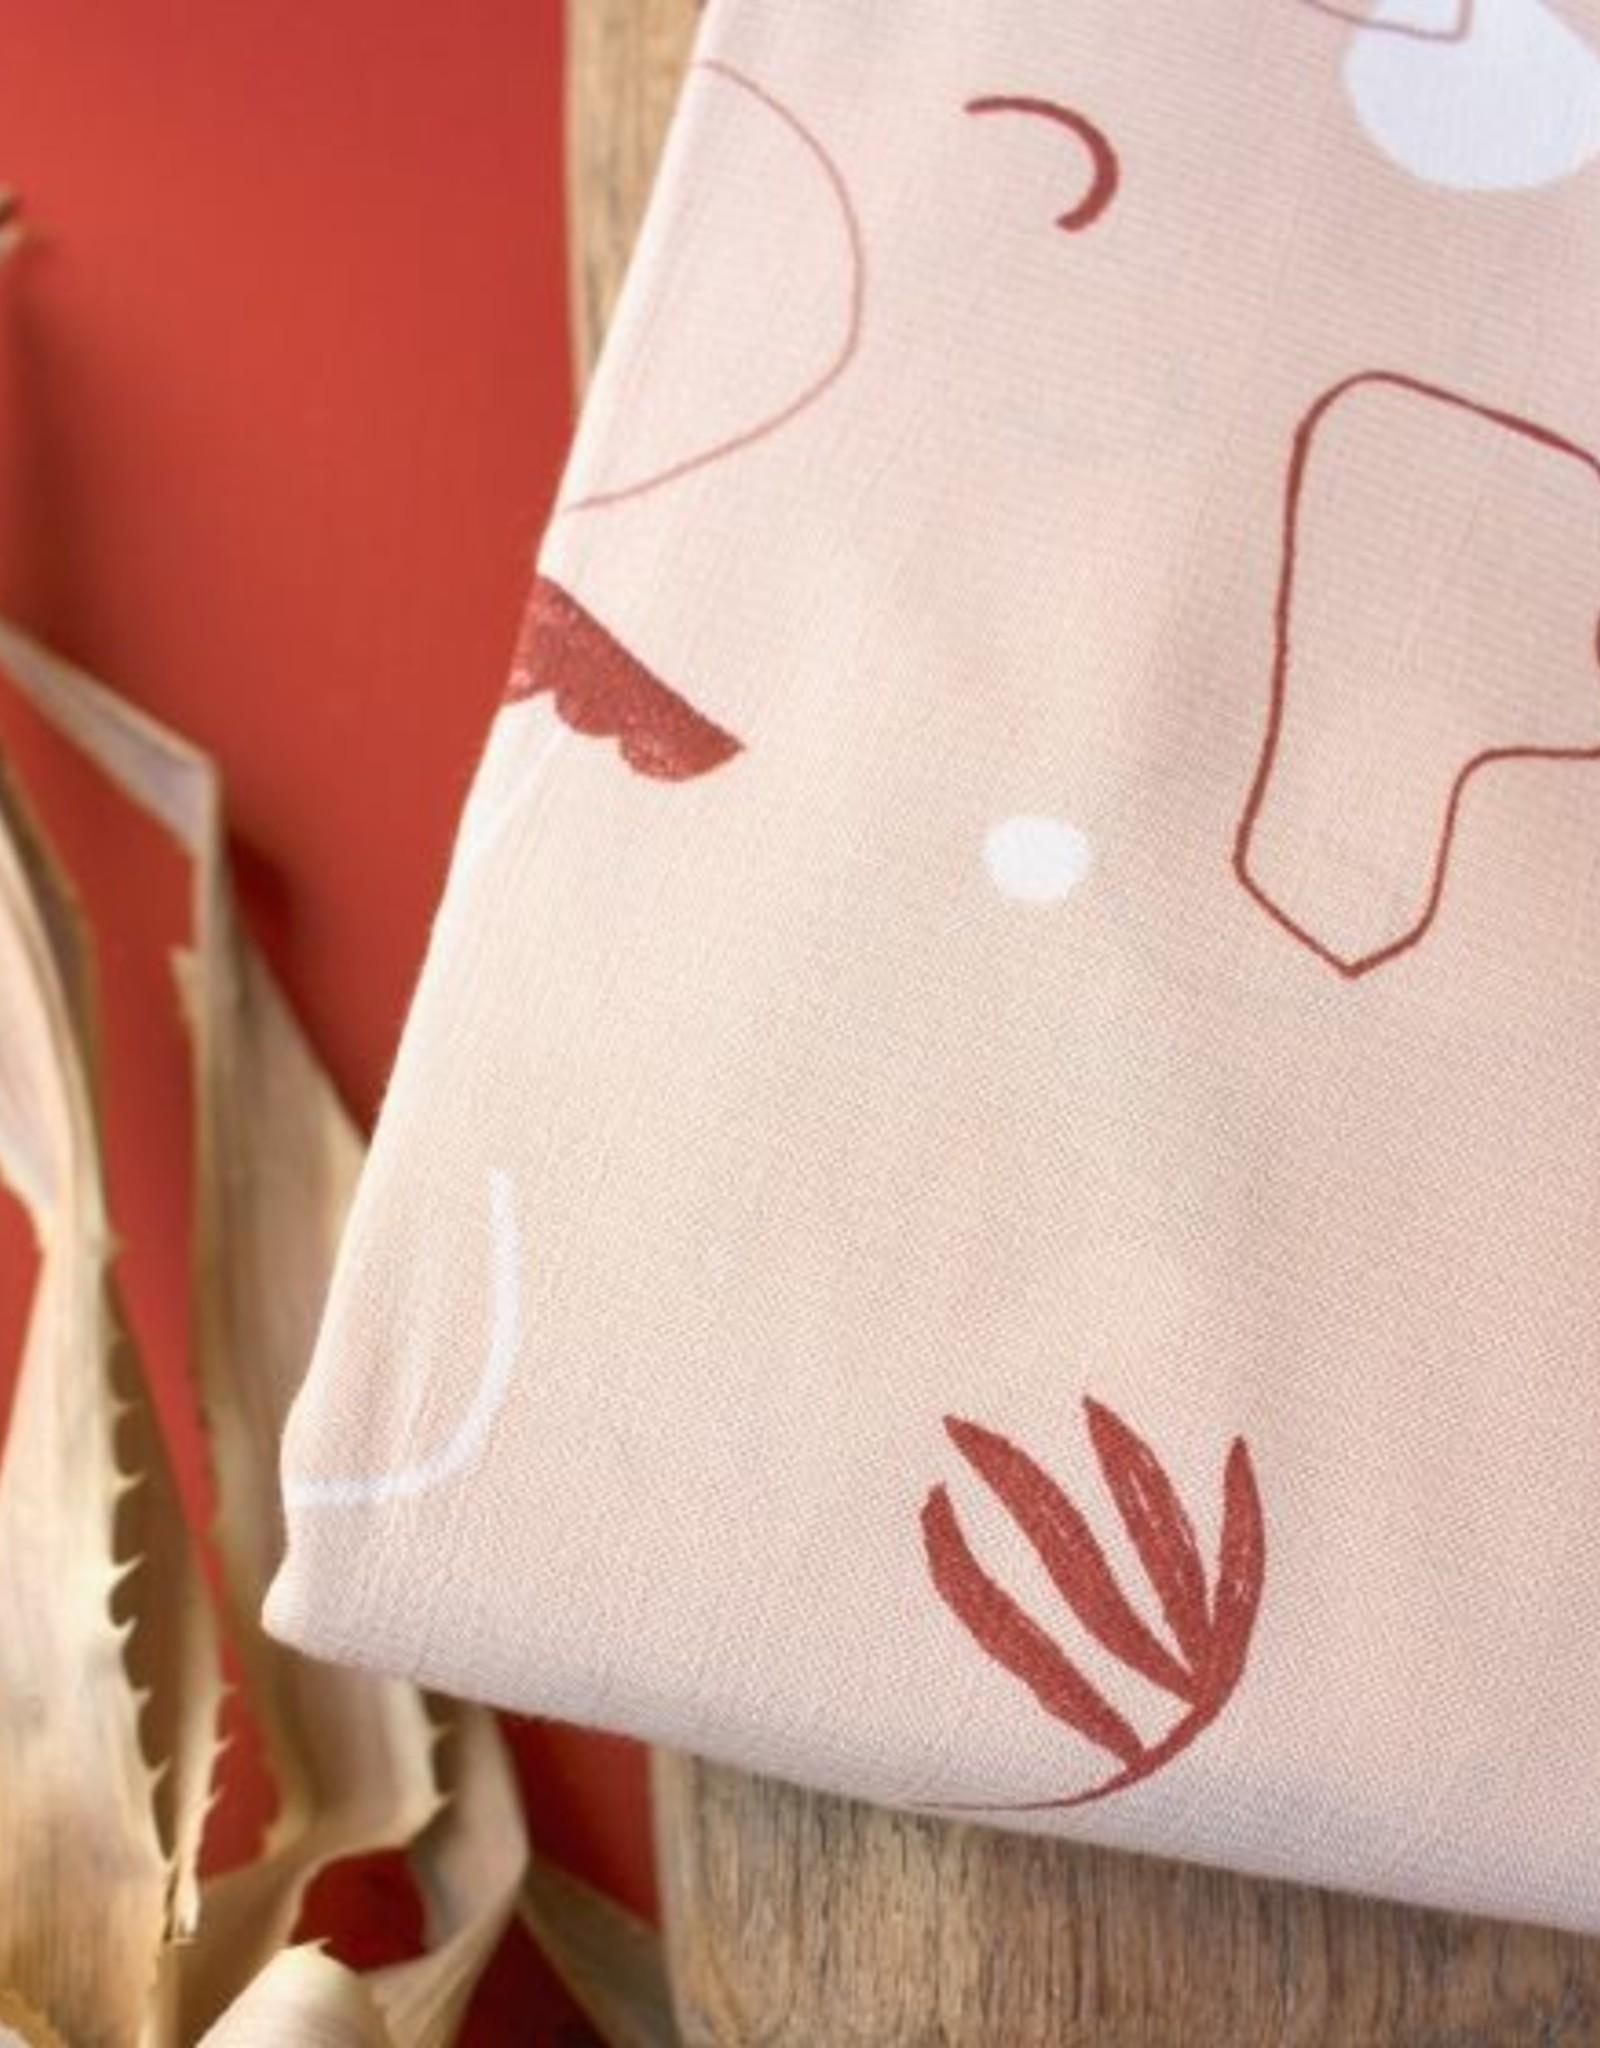 Atelier Brunette Sandstorm Blush